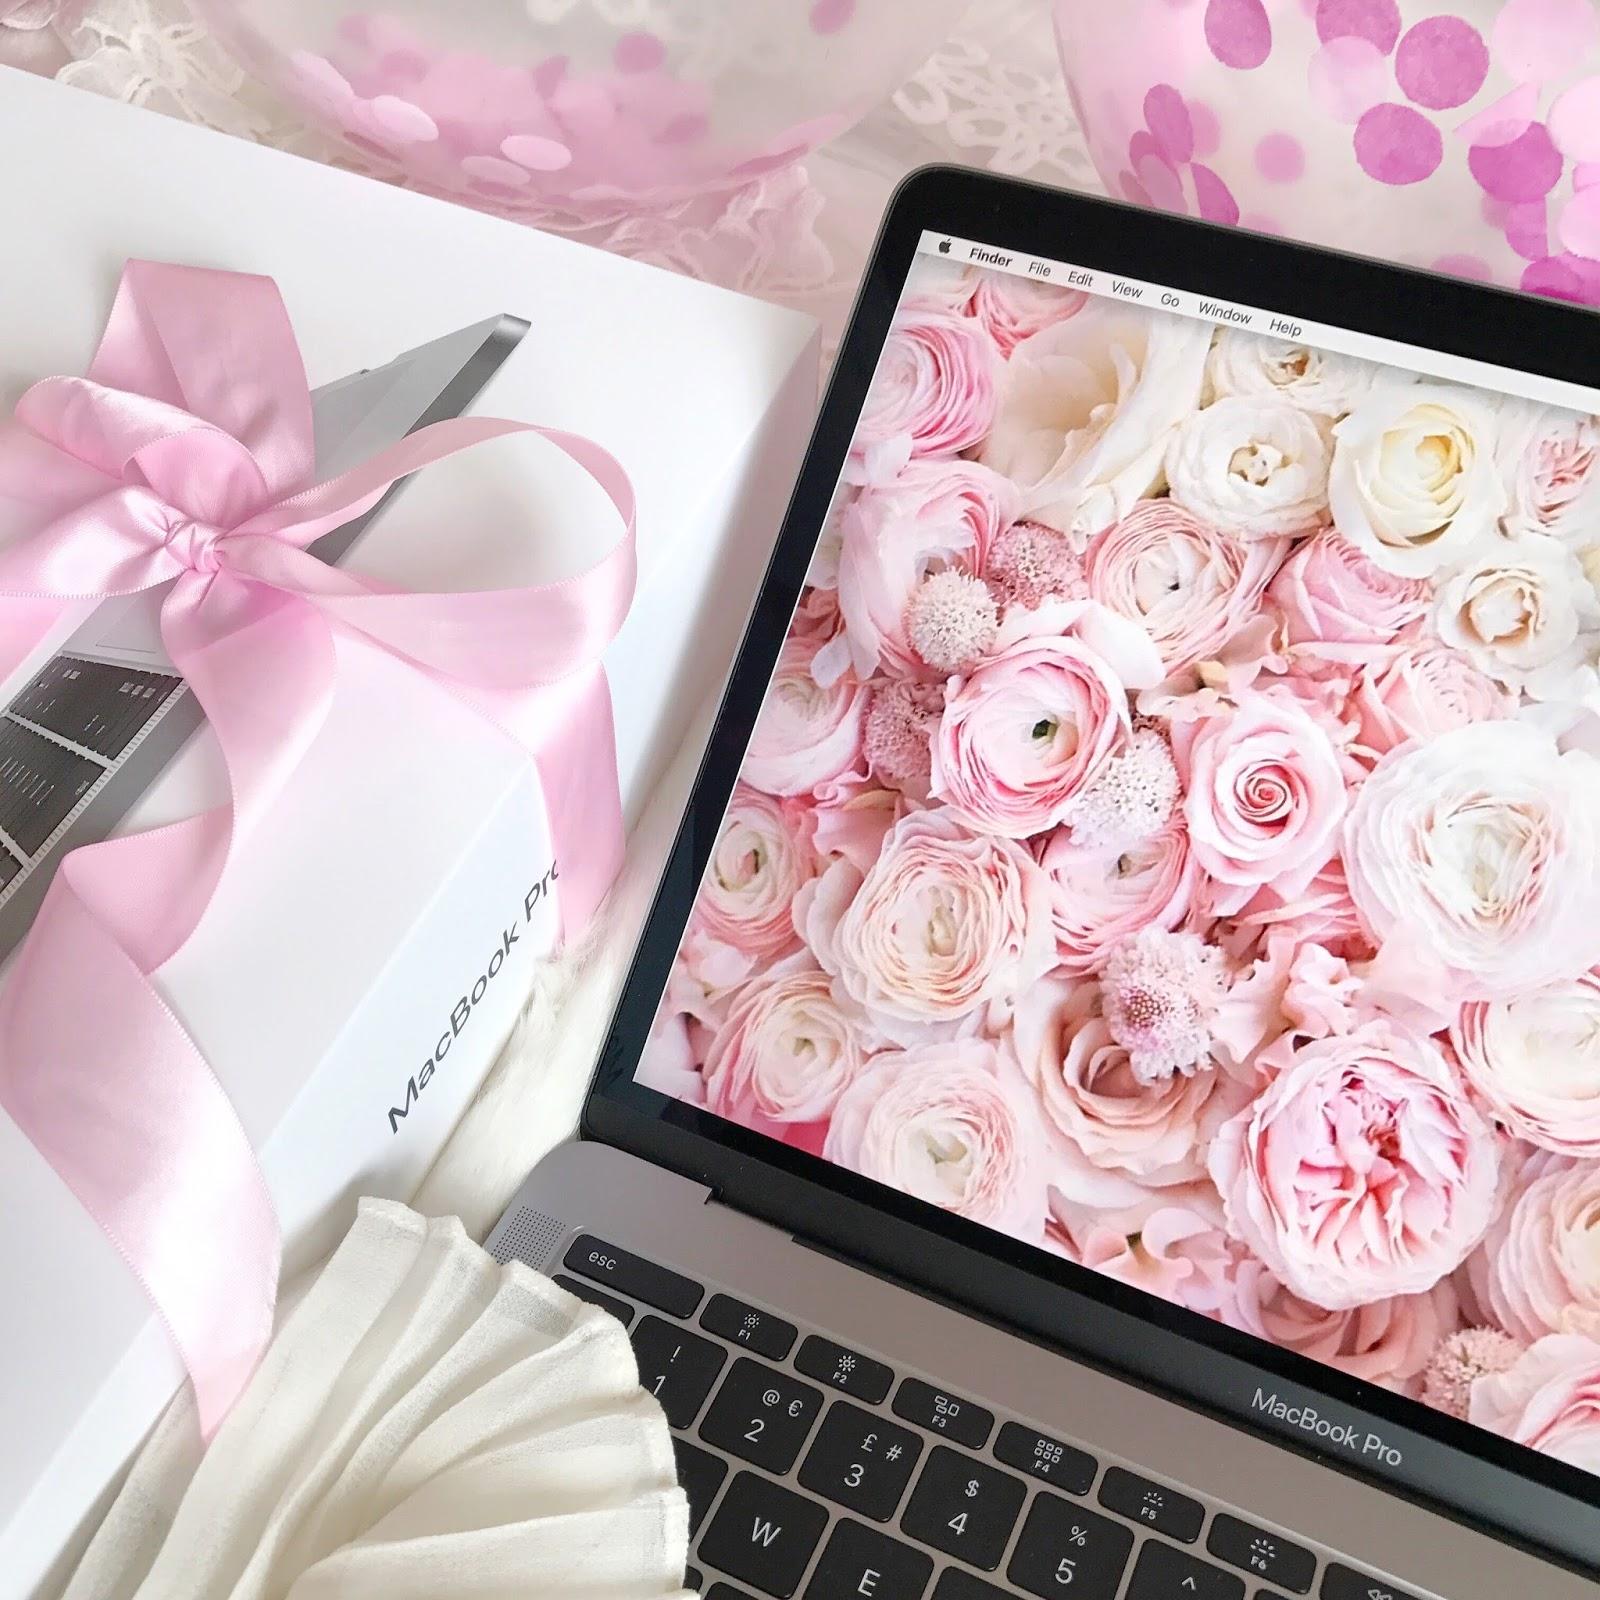 MacBook Pro Birthday Present